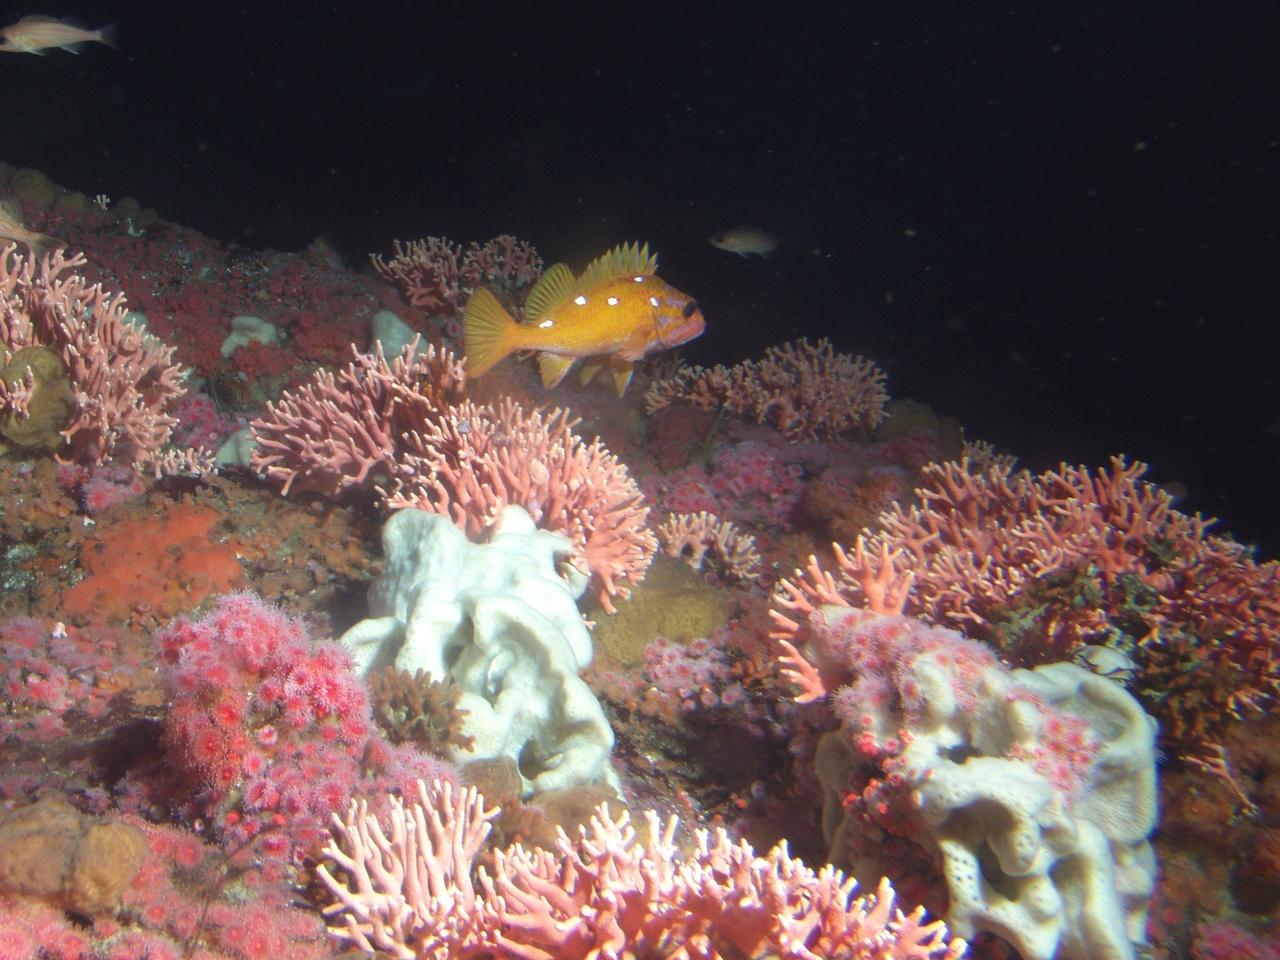 A rosy rockfish swimming among California hydrocoral.